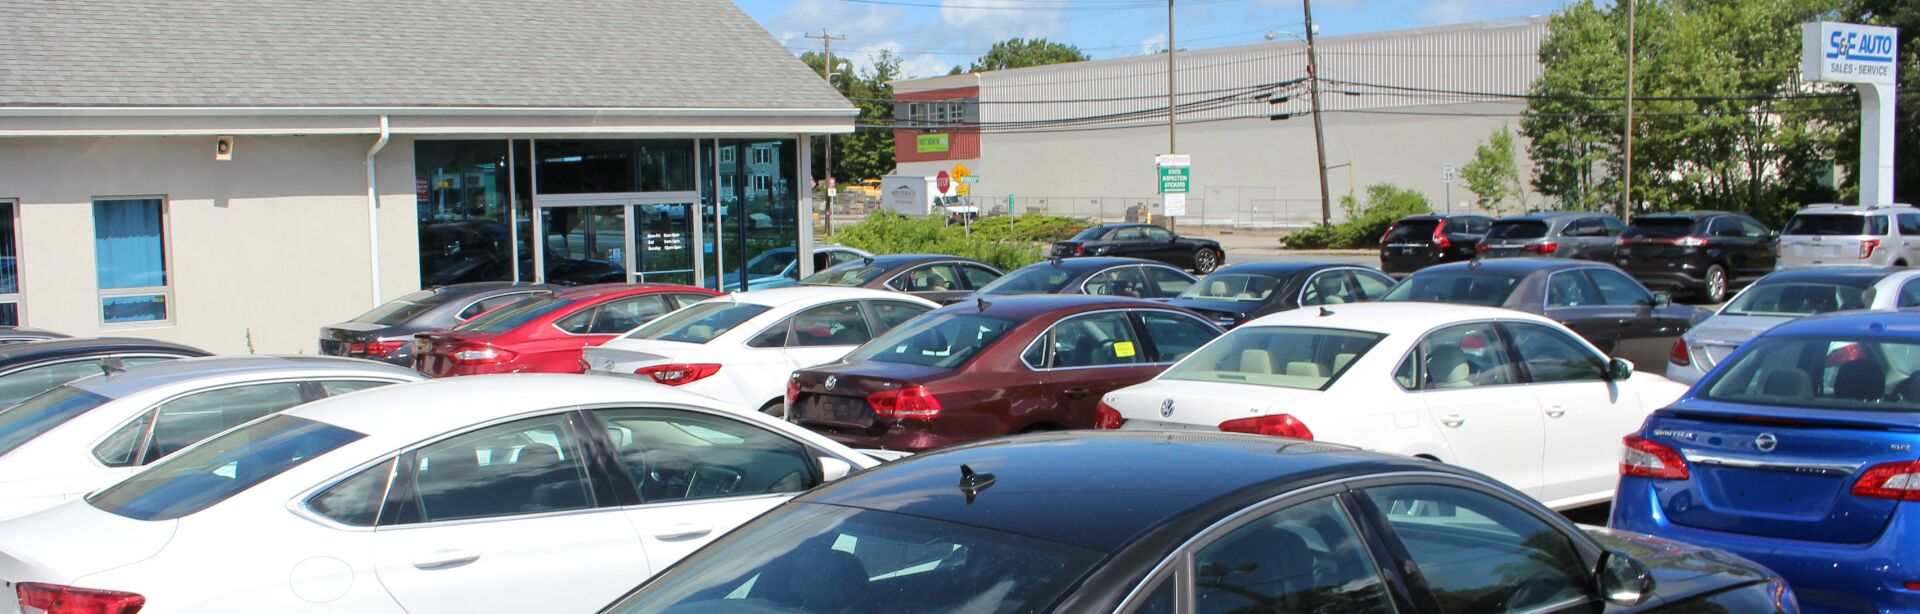 Used Car Dealership Weymouth Ma S E Auto Sales